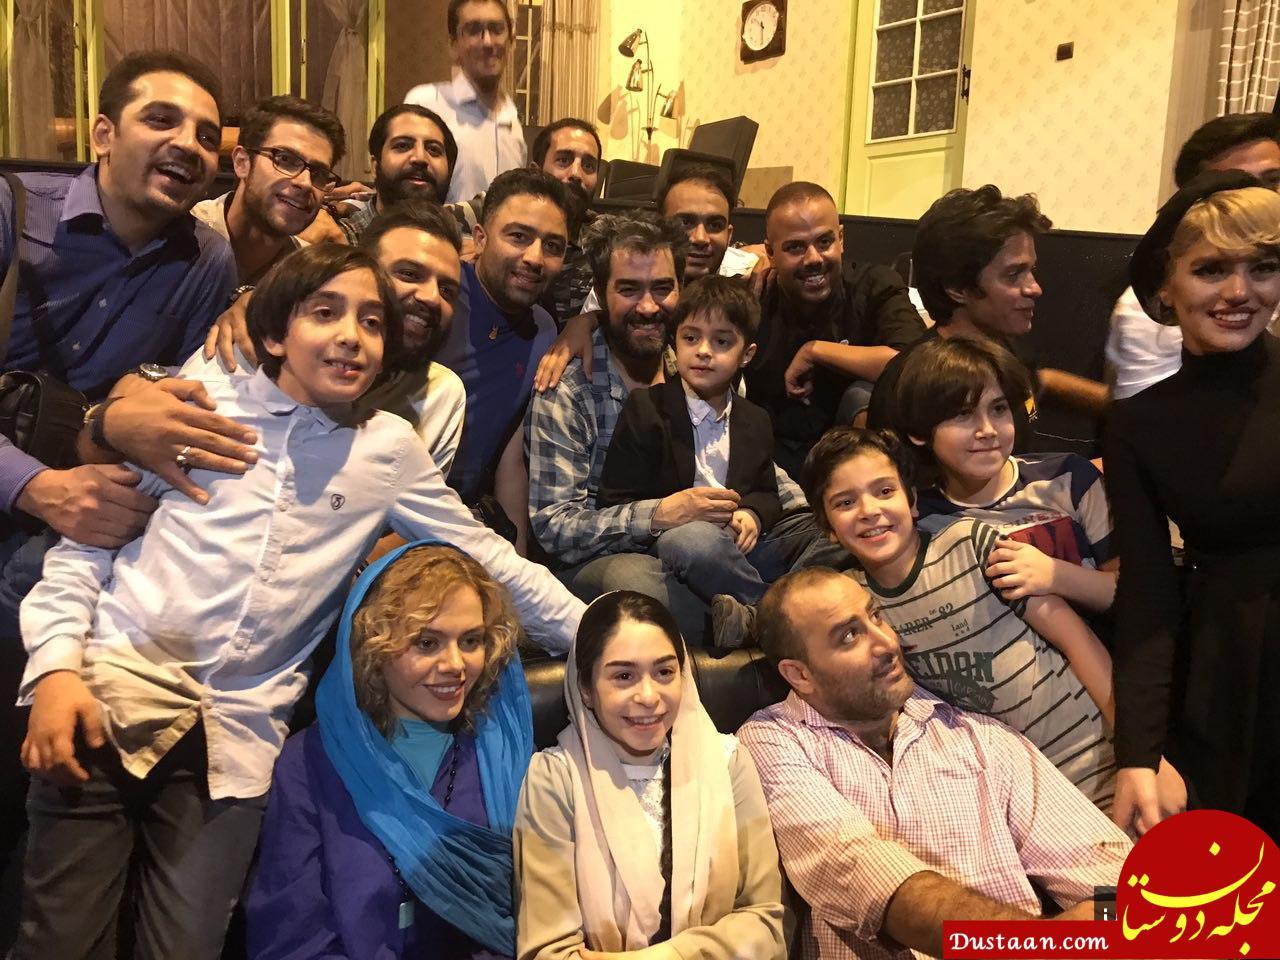 www.dustaan.com سریال تلویزیونی «سرزمین مادری» به کجا رسید؟